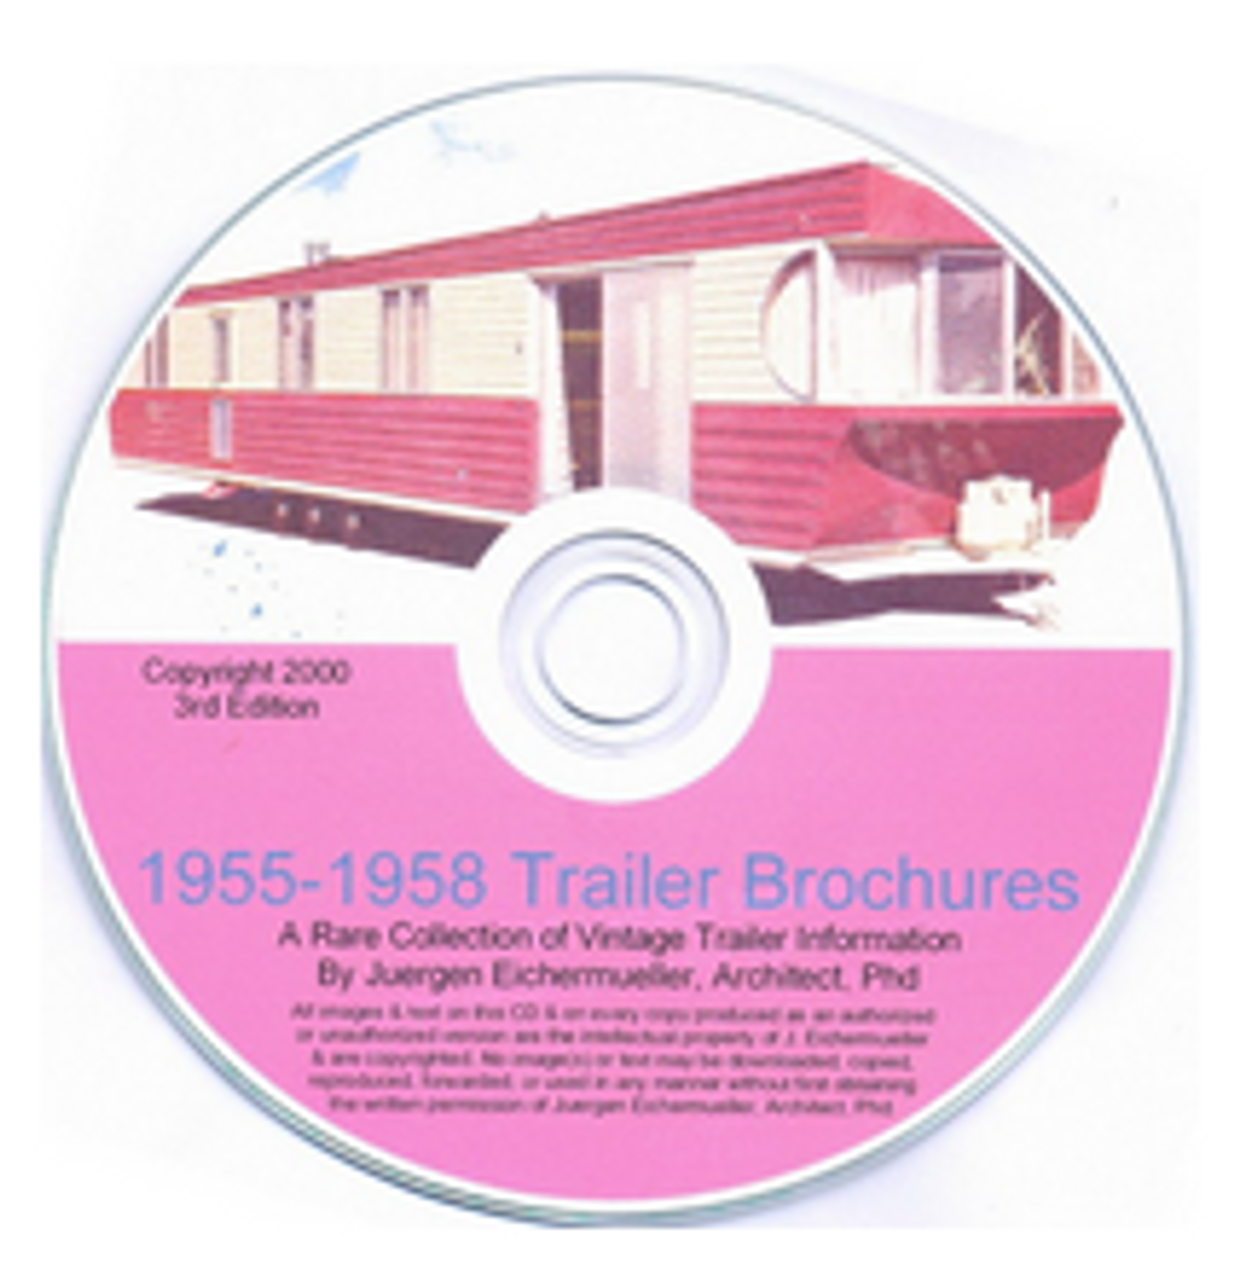 CD-ROM 1955-1958 Trailer Brochures (CBL011)